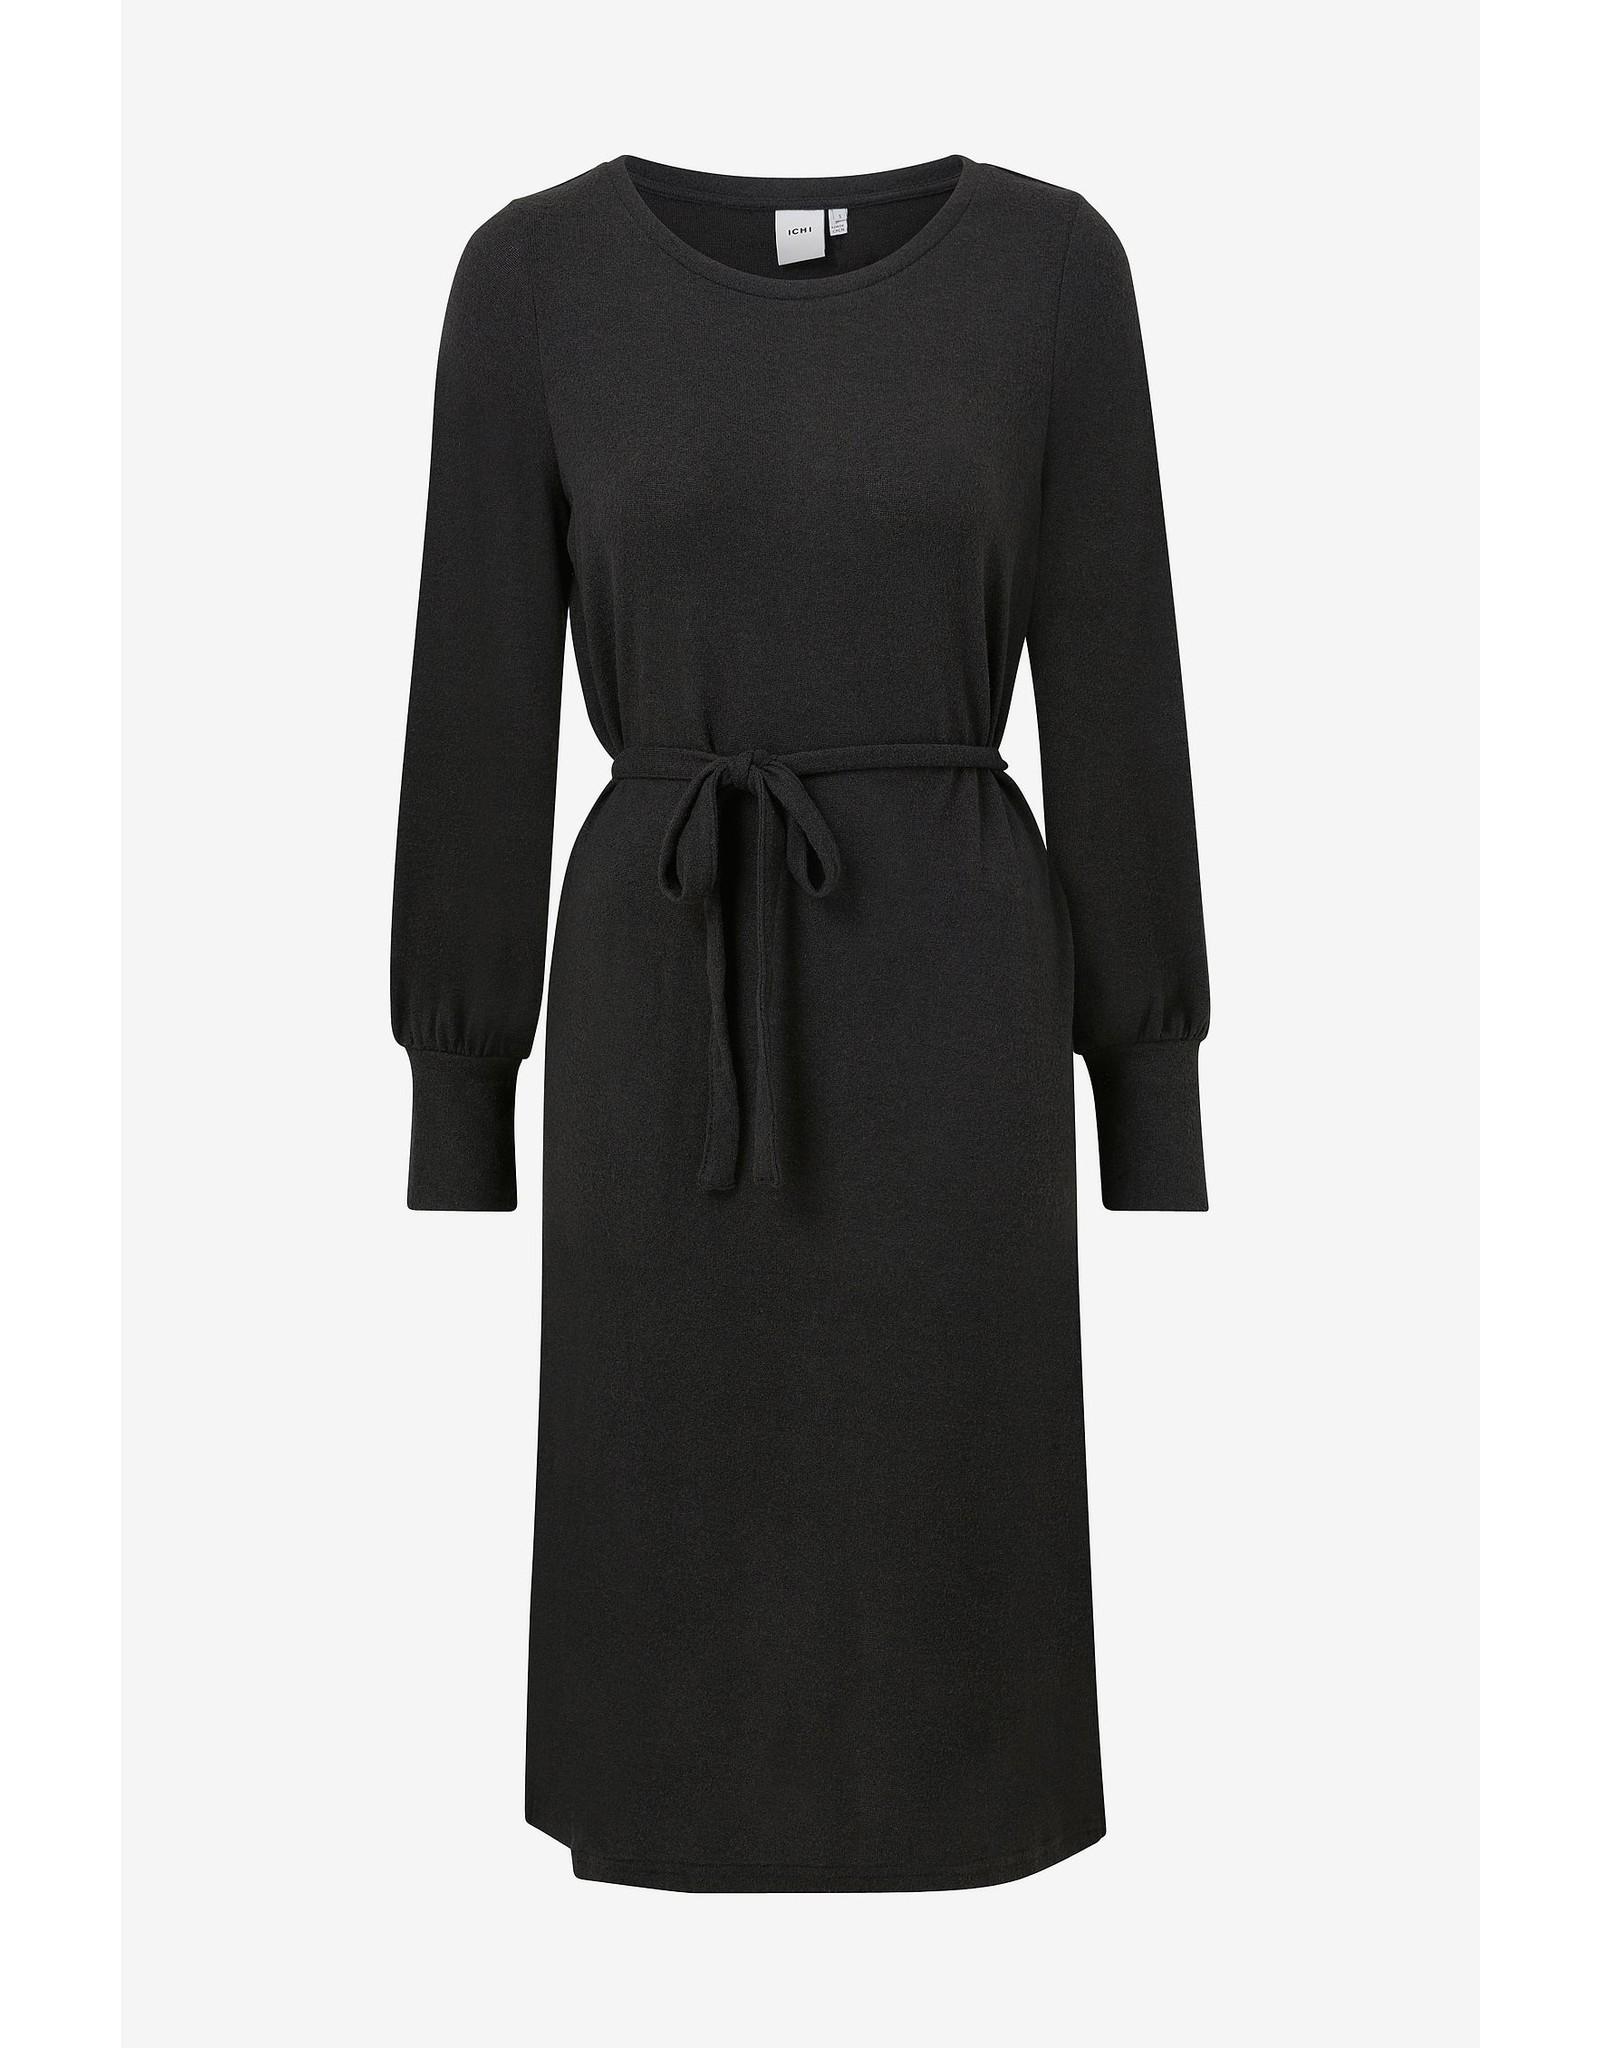 IDK - LS Jersey Dress